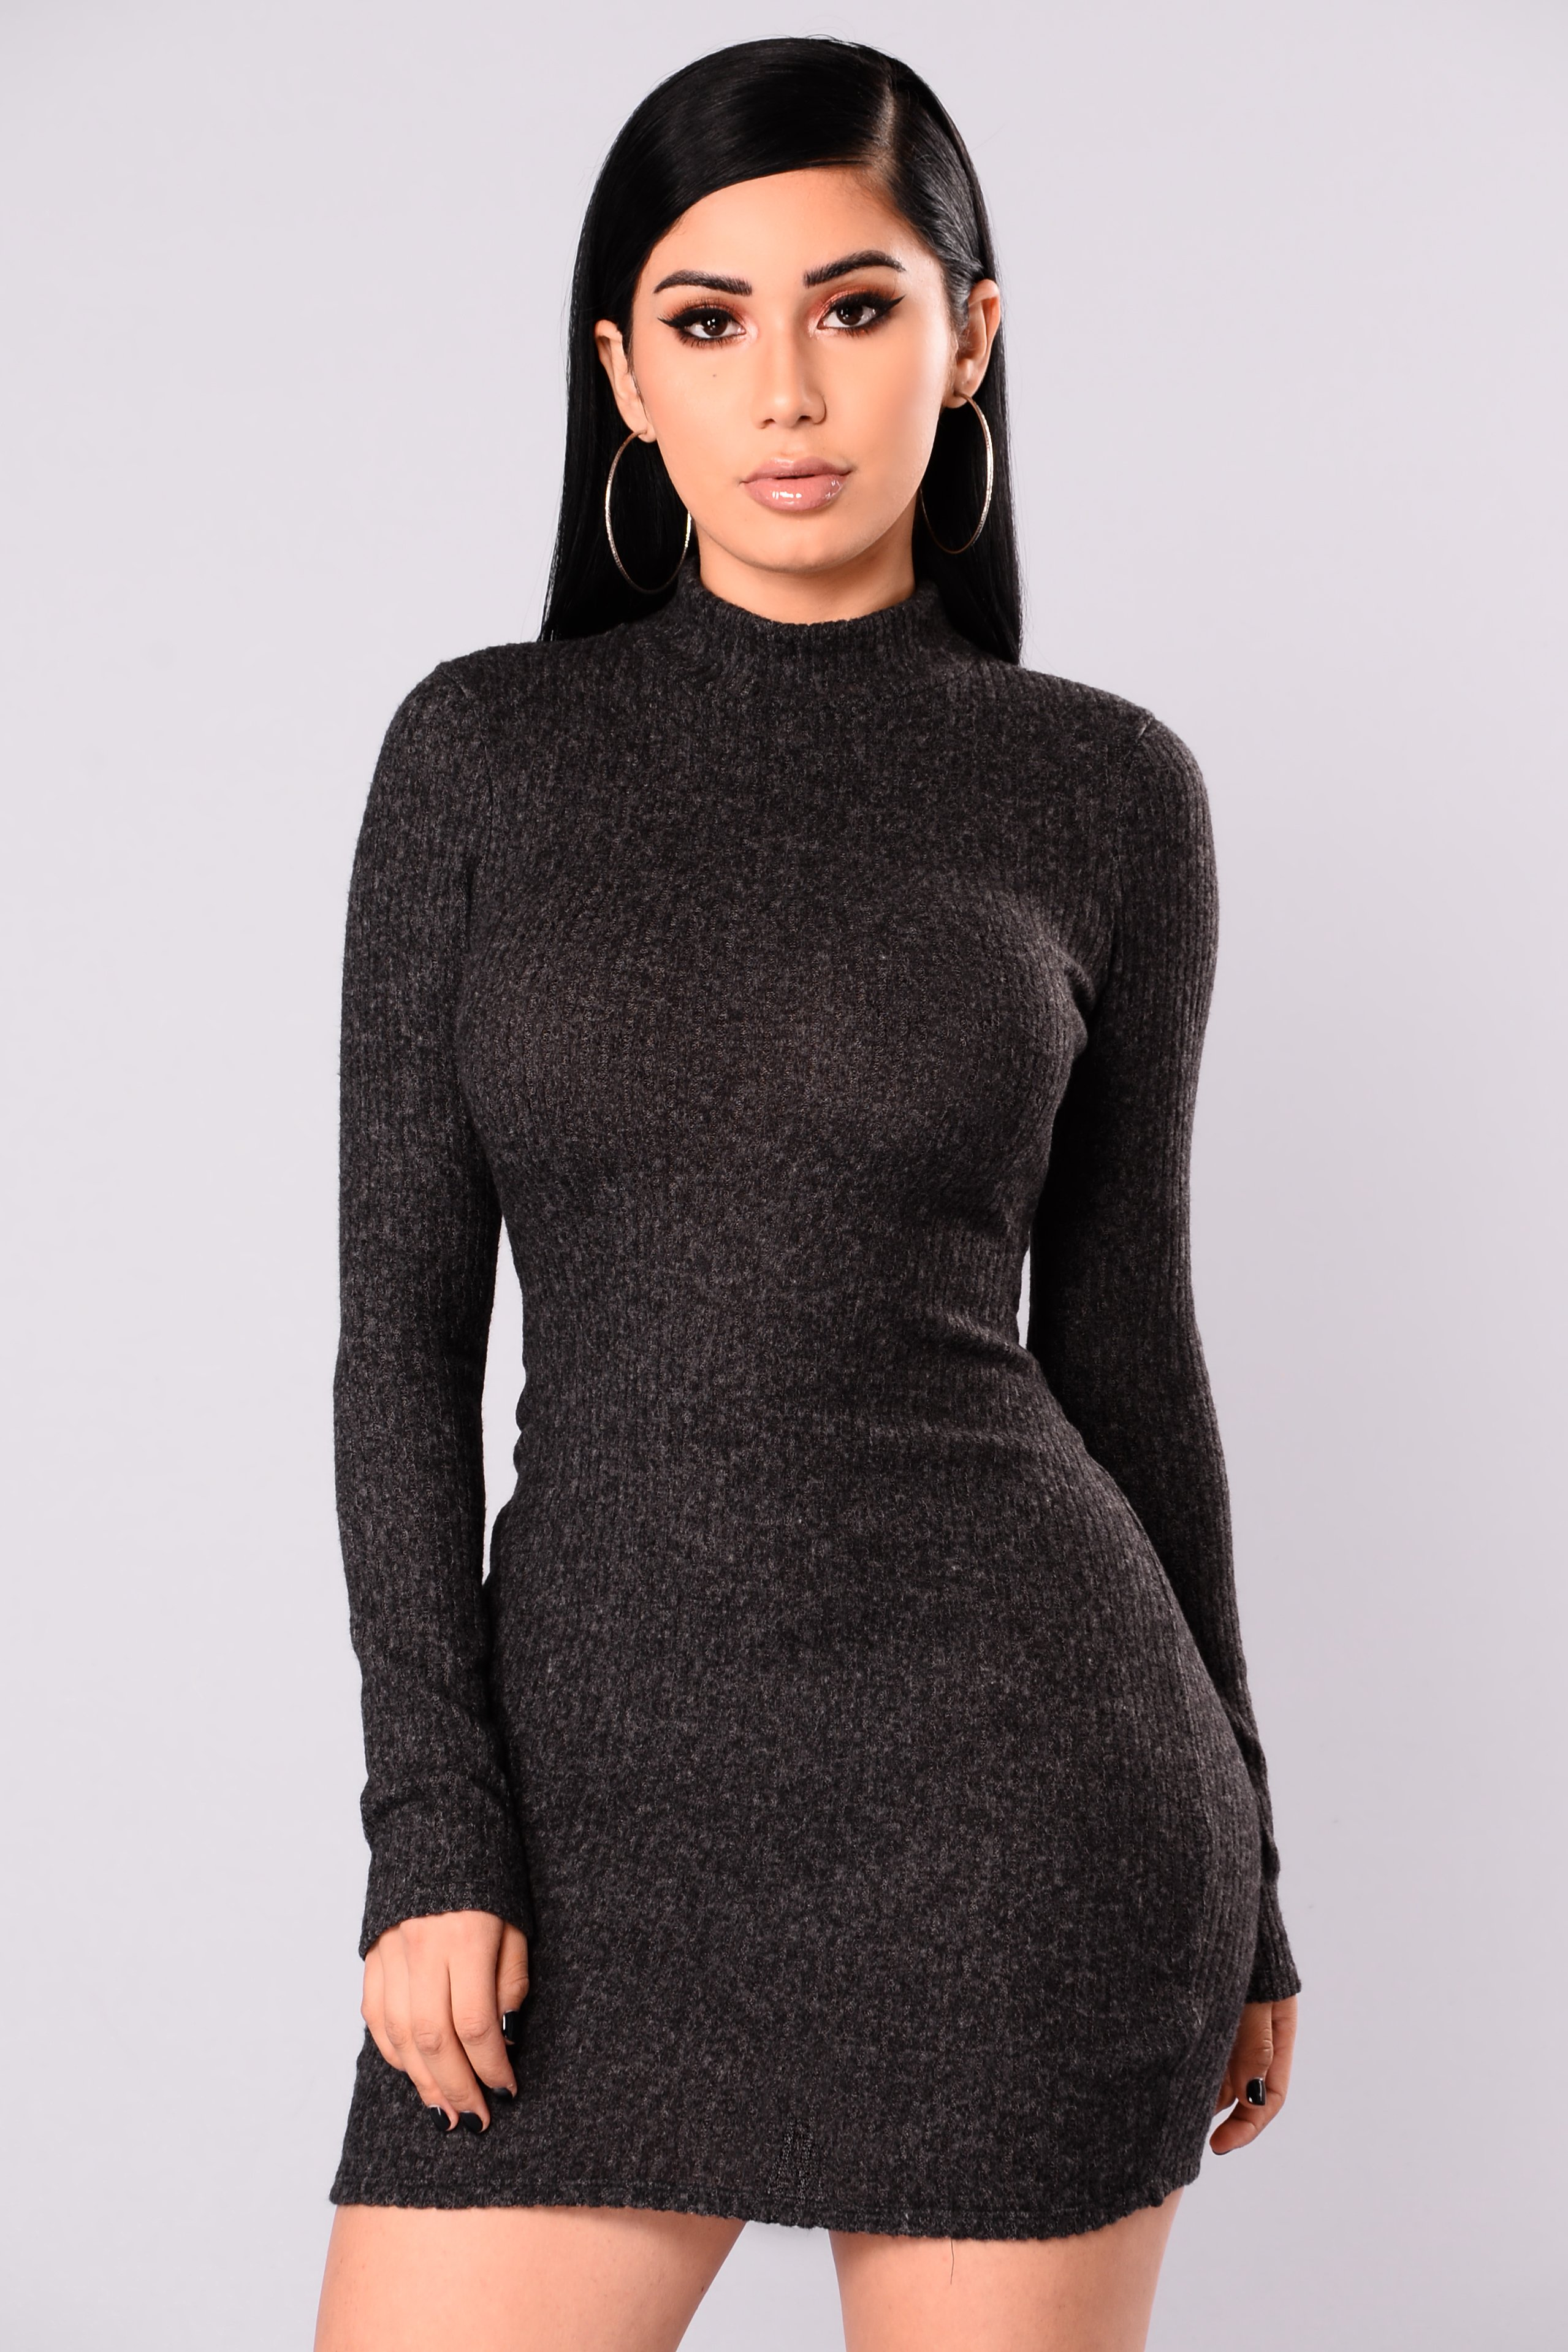 soft side sweater dress - charcoal KEWEYJX